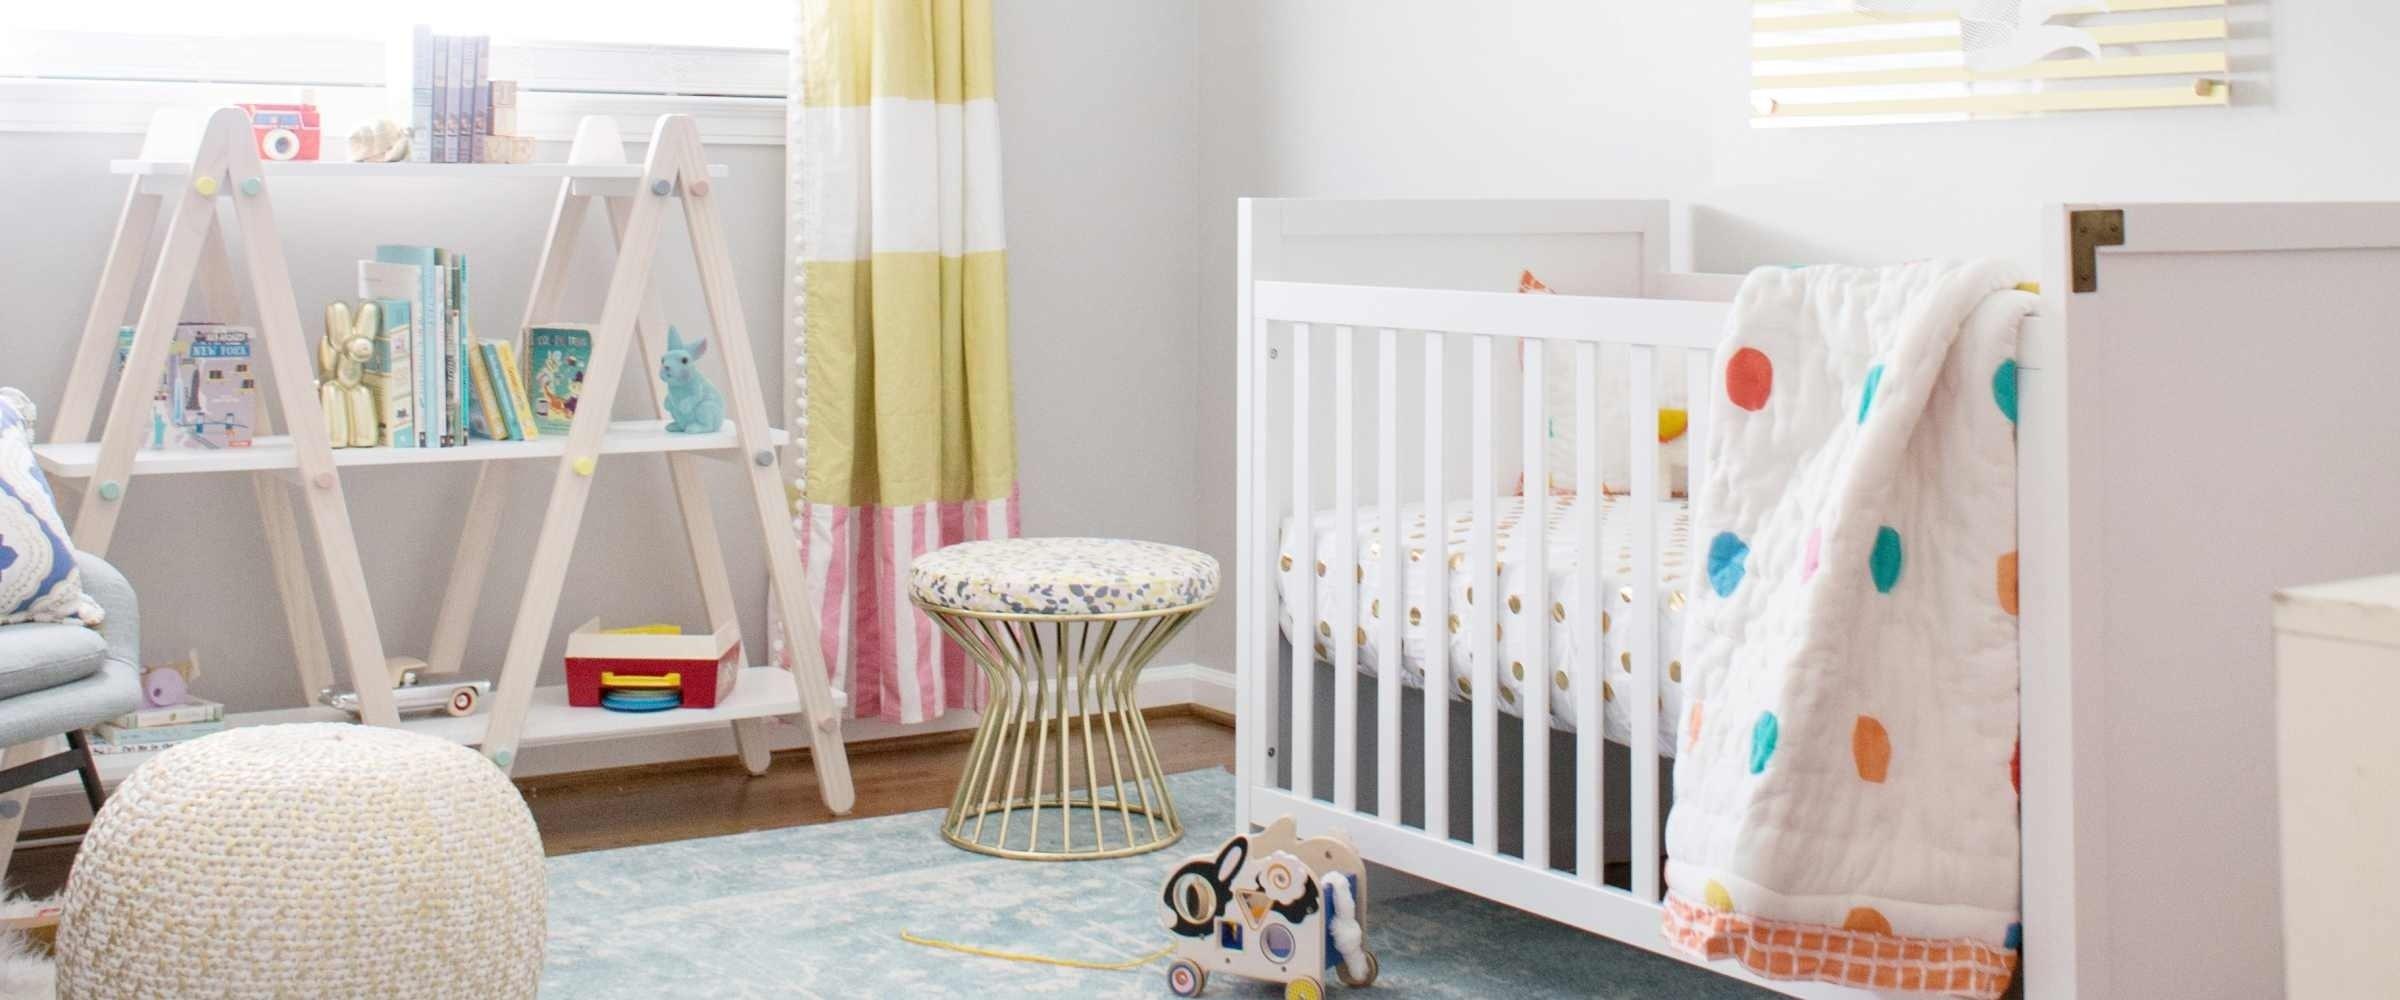 10 Fashionable Yellow And Gray Nursery Ideas yellow and gray neutral nursery ideas lay baby lay 2020